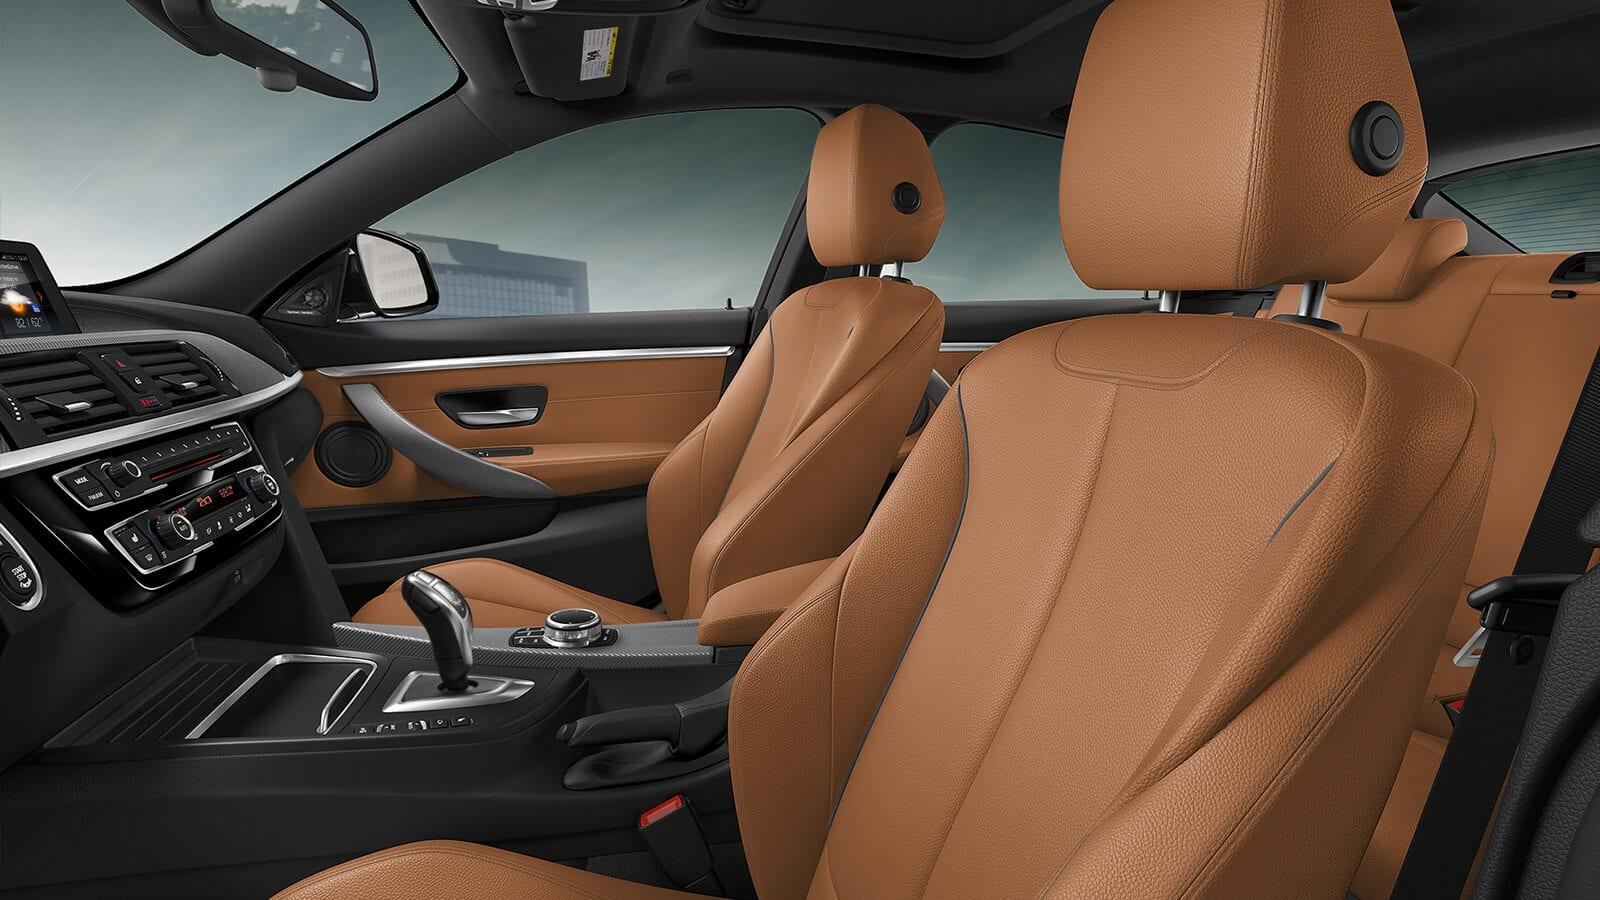 2020 BMW 4 Series Cockpit